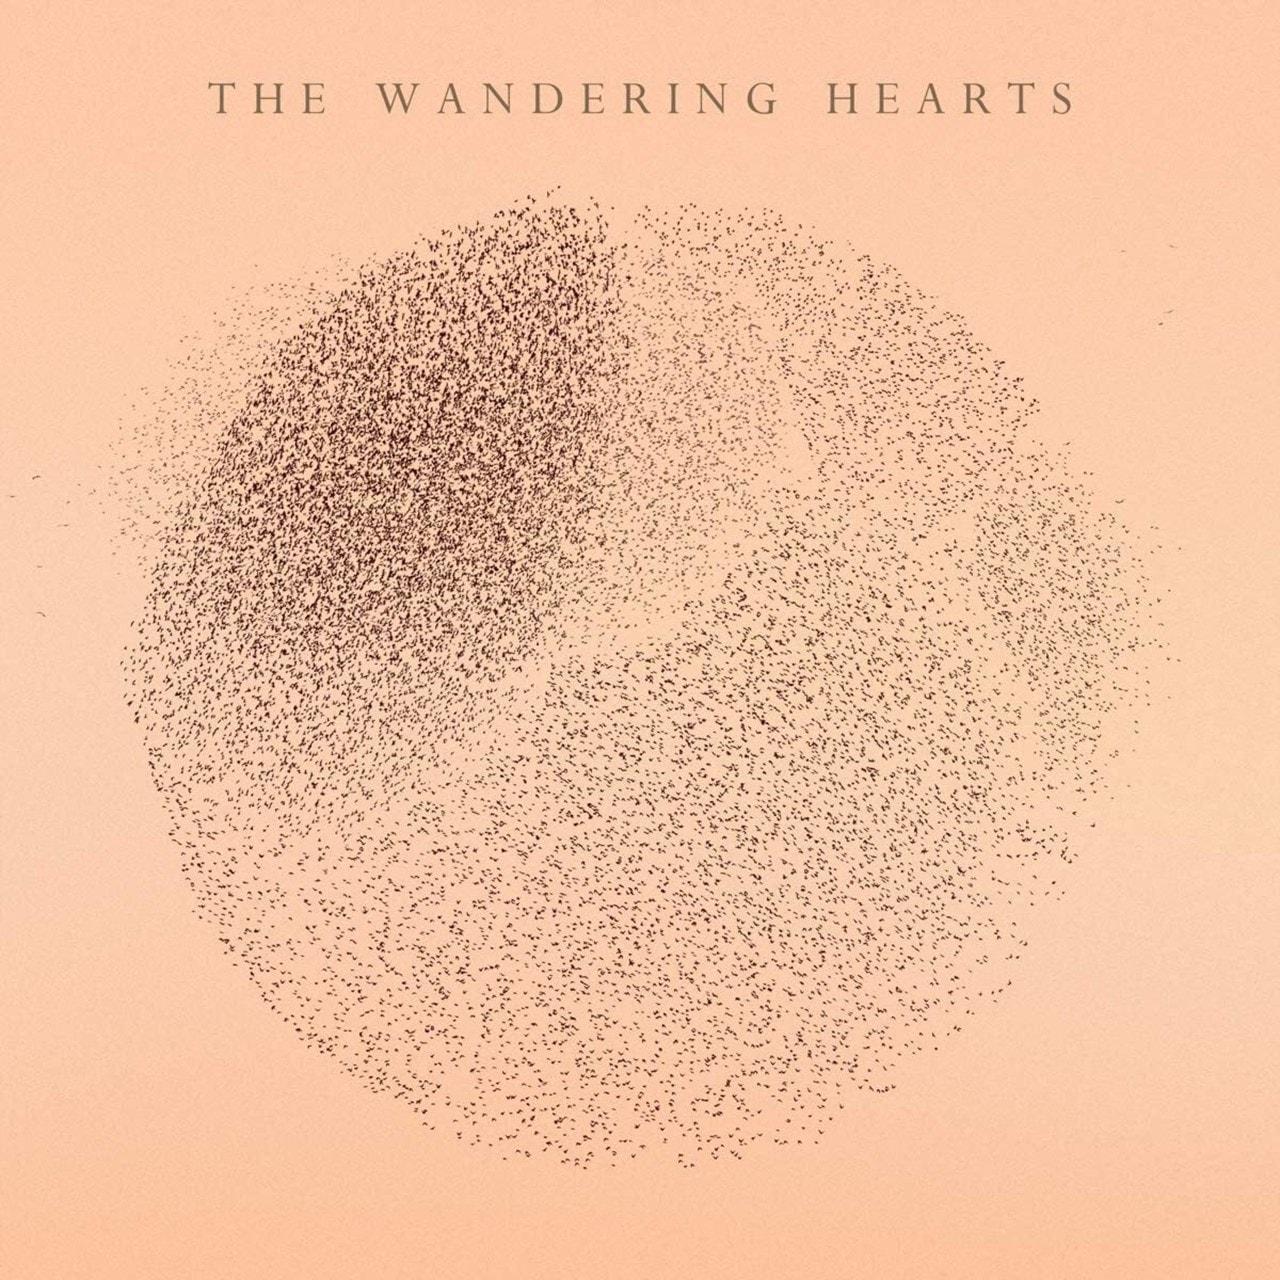 The Wandering Hearts - 1